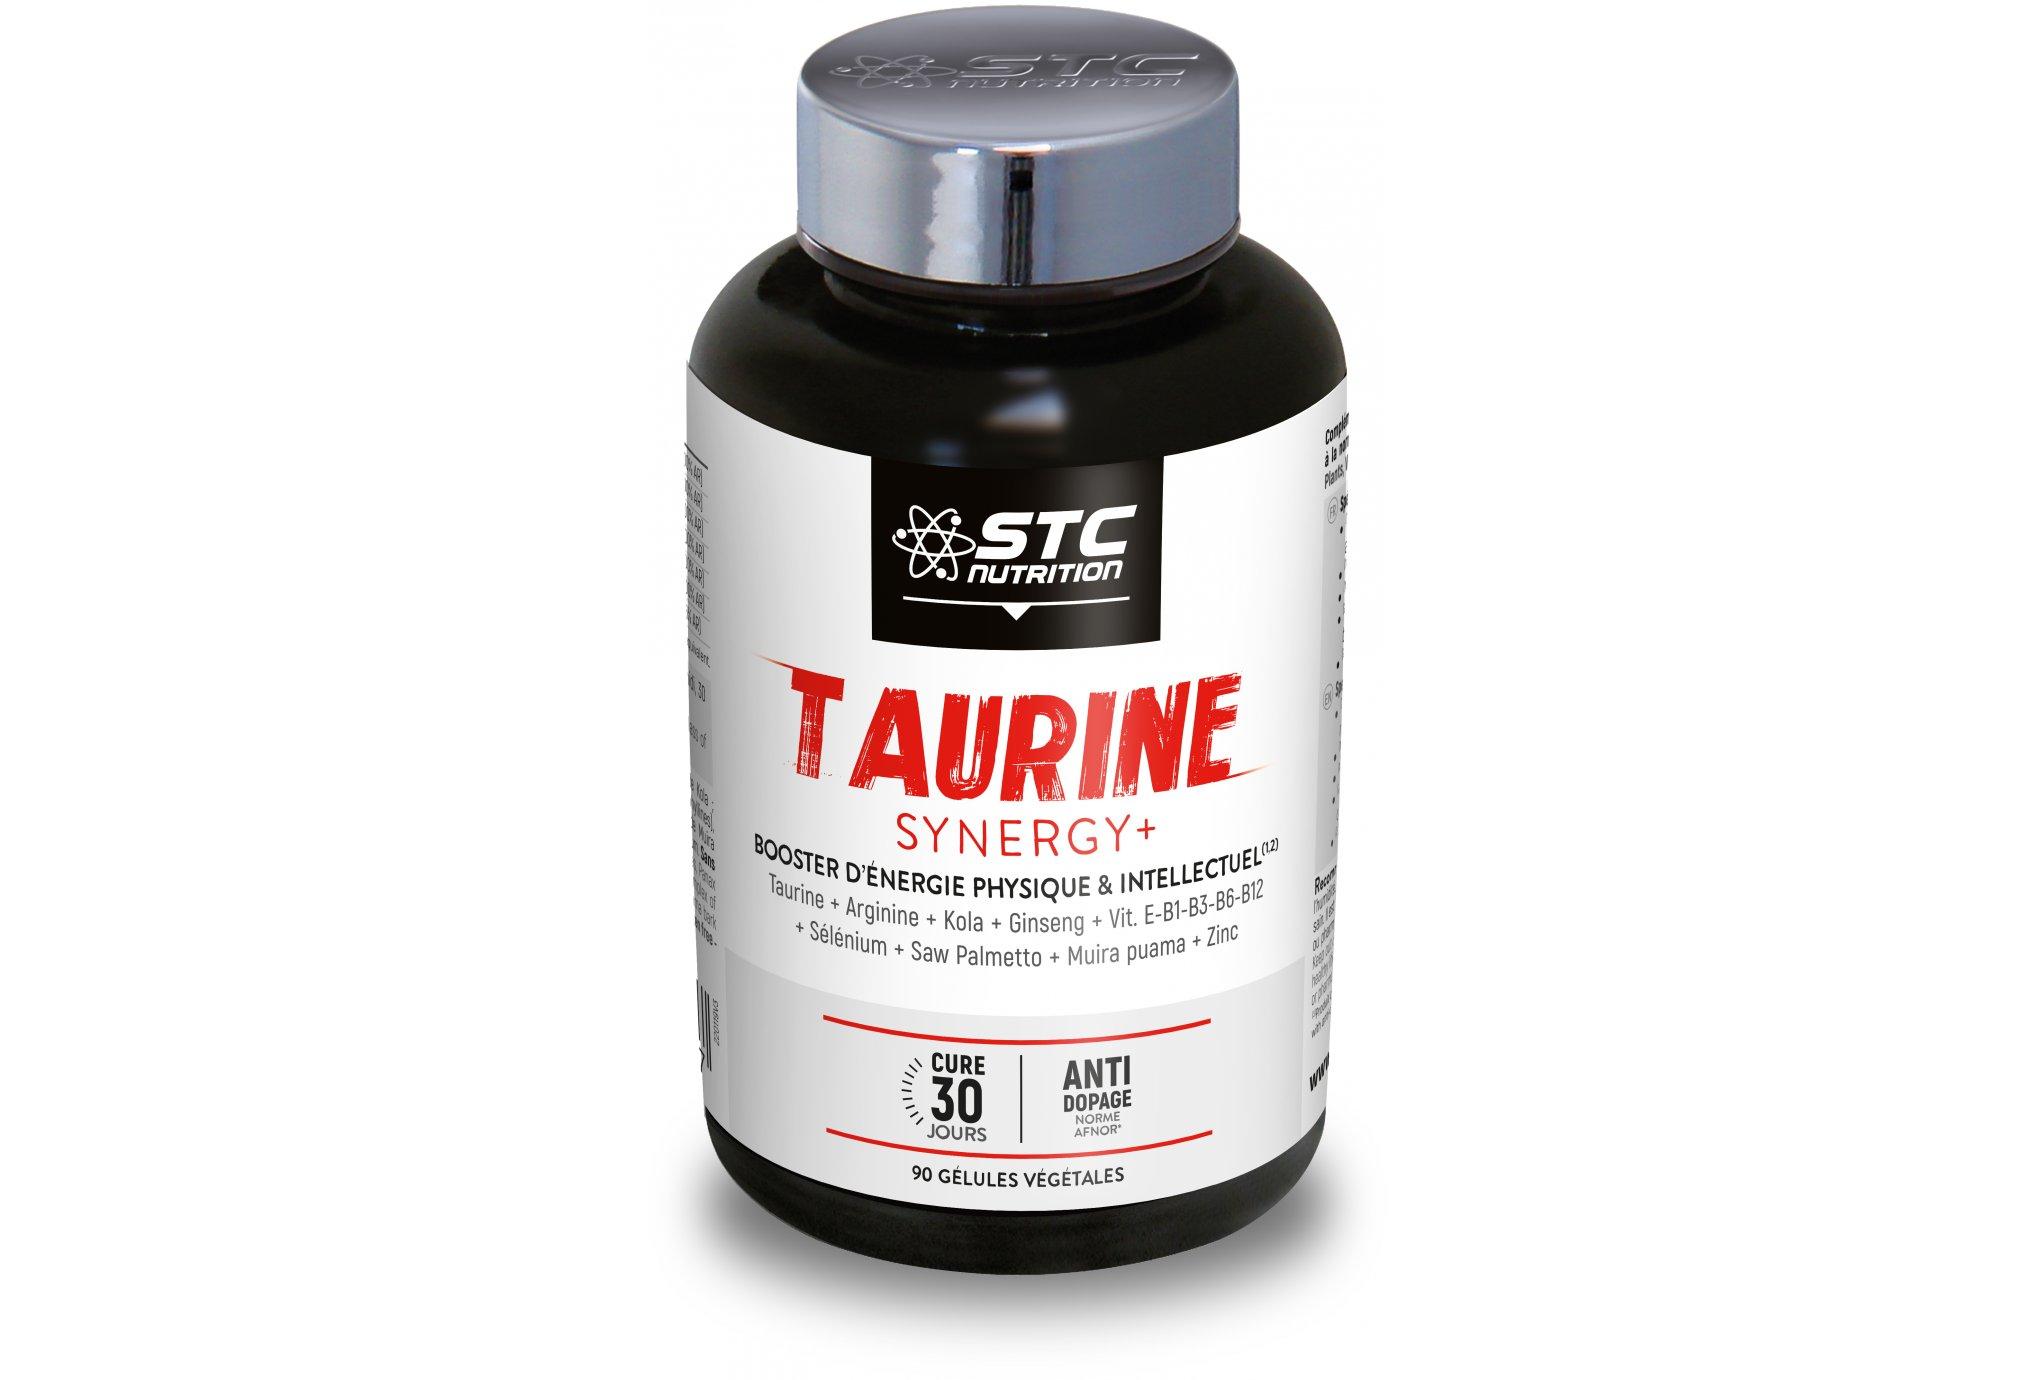 STC Nutrition Taurine Synergy + 90 cápsulas Diététique Compléments